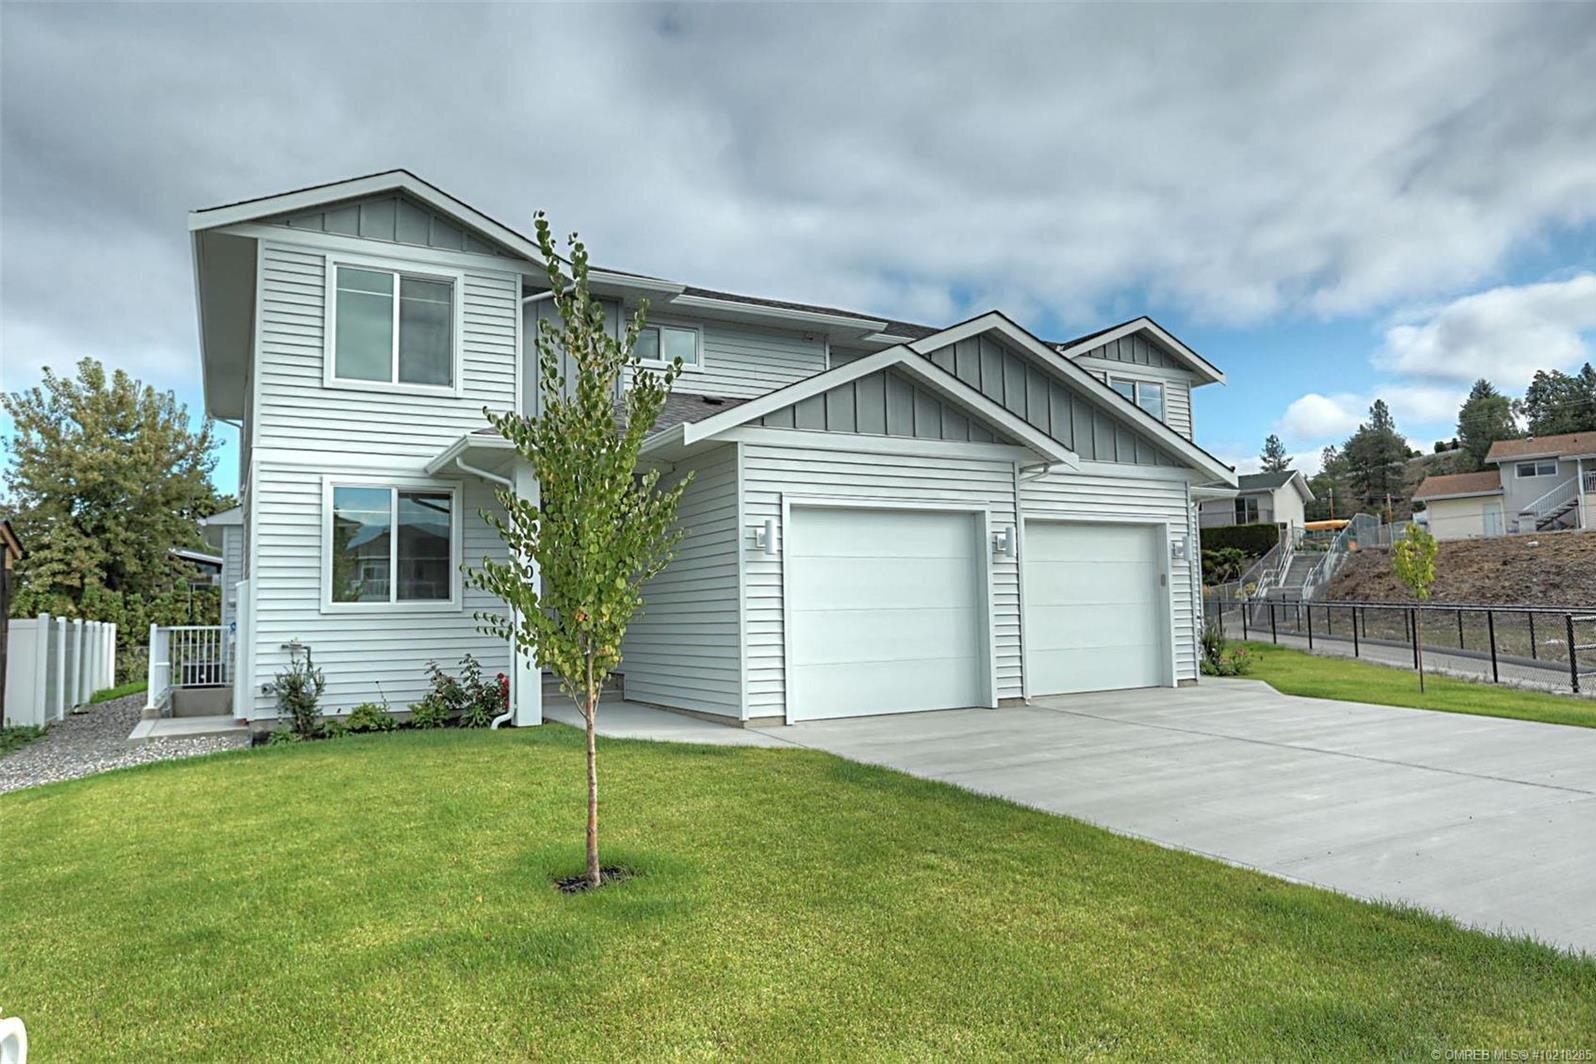 Townhouse for sale at 472 Sugars Ave Kelowna British Columbia - MLS: 10218285